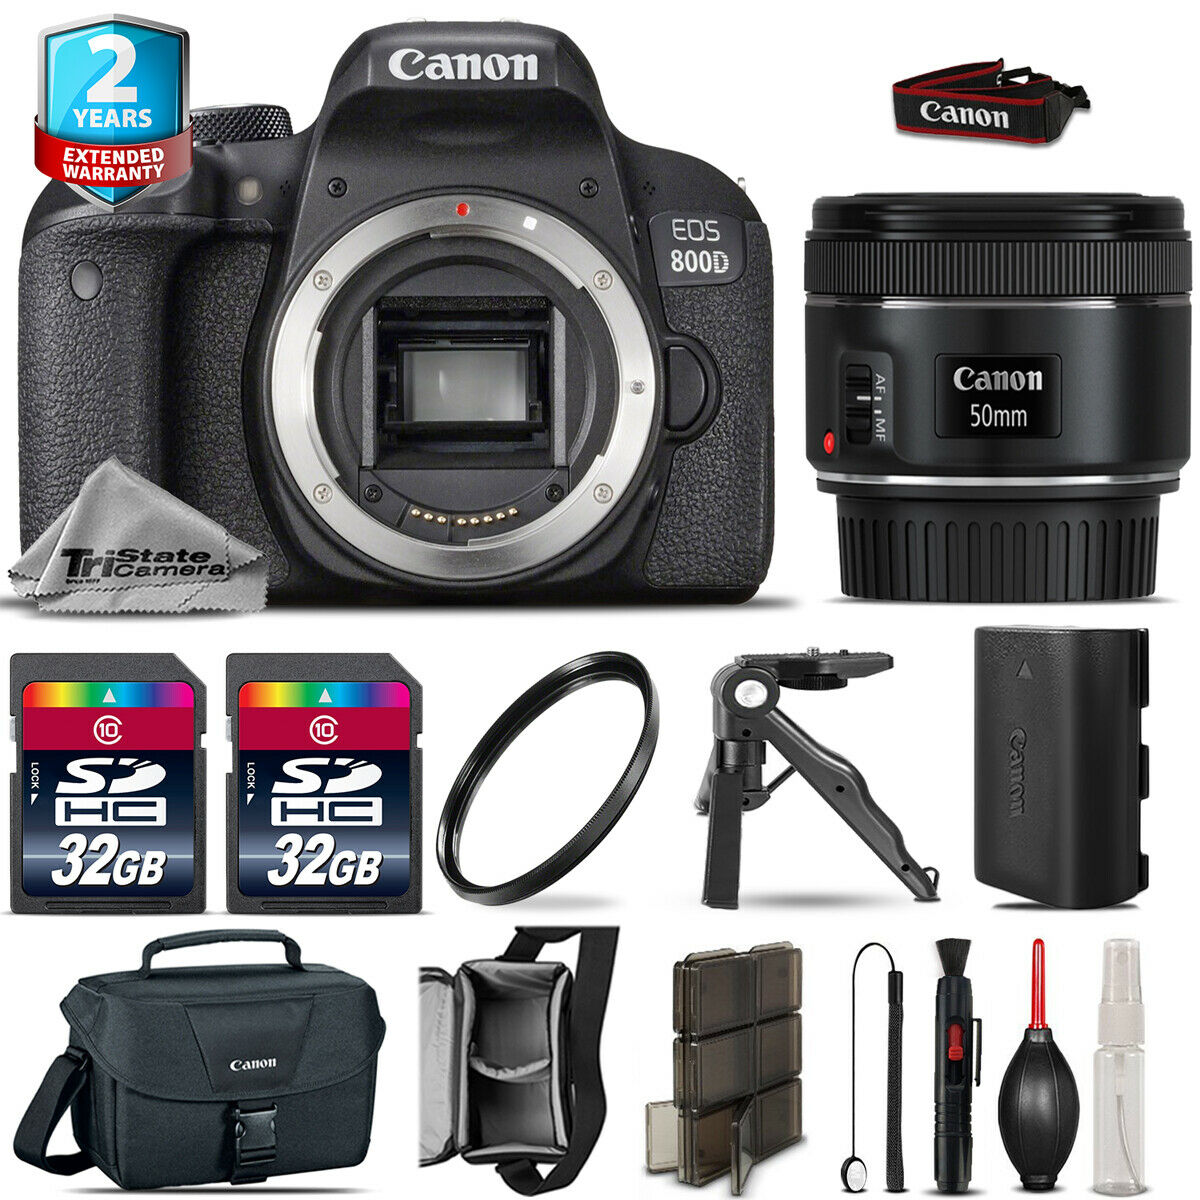 Canon Rebel 800D T7i Camera + 50mm 1.8 + LED +CASE + EXT BAT +32GB +2yr Warranty